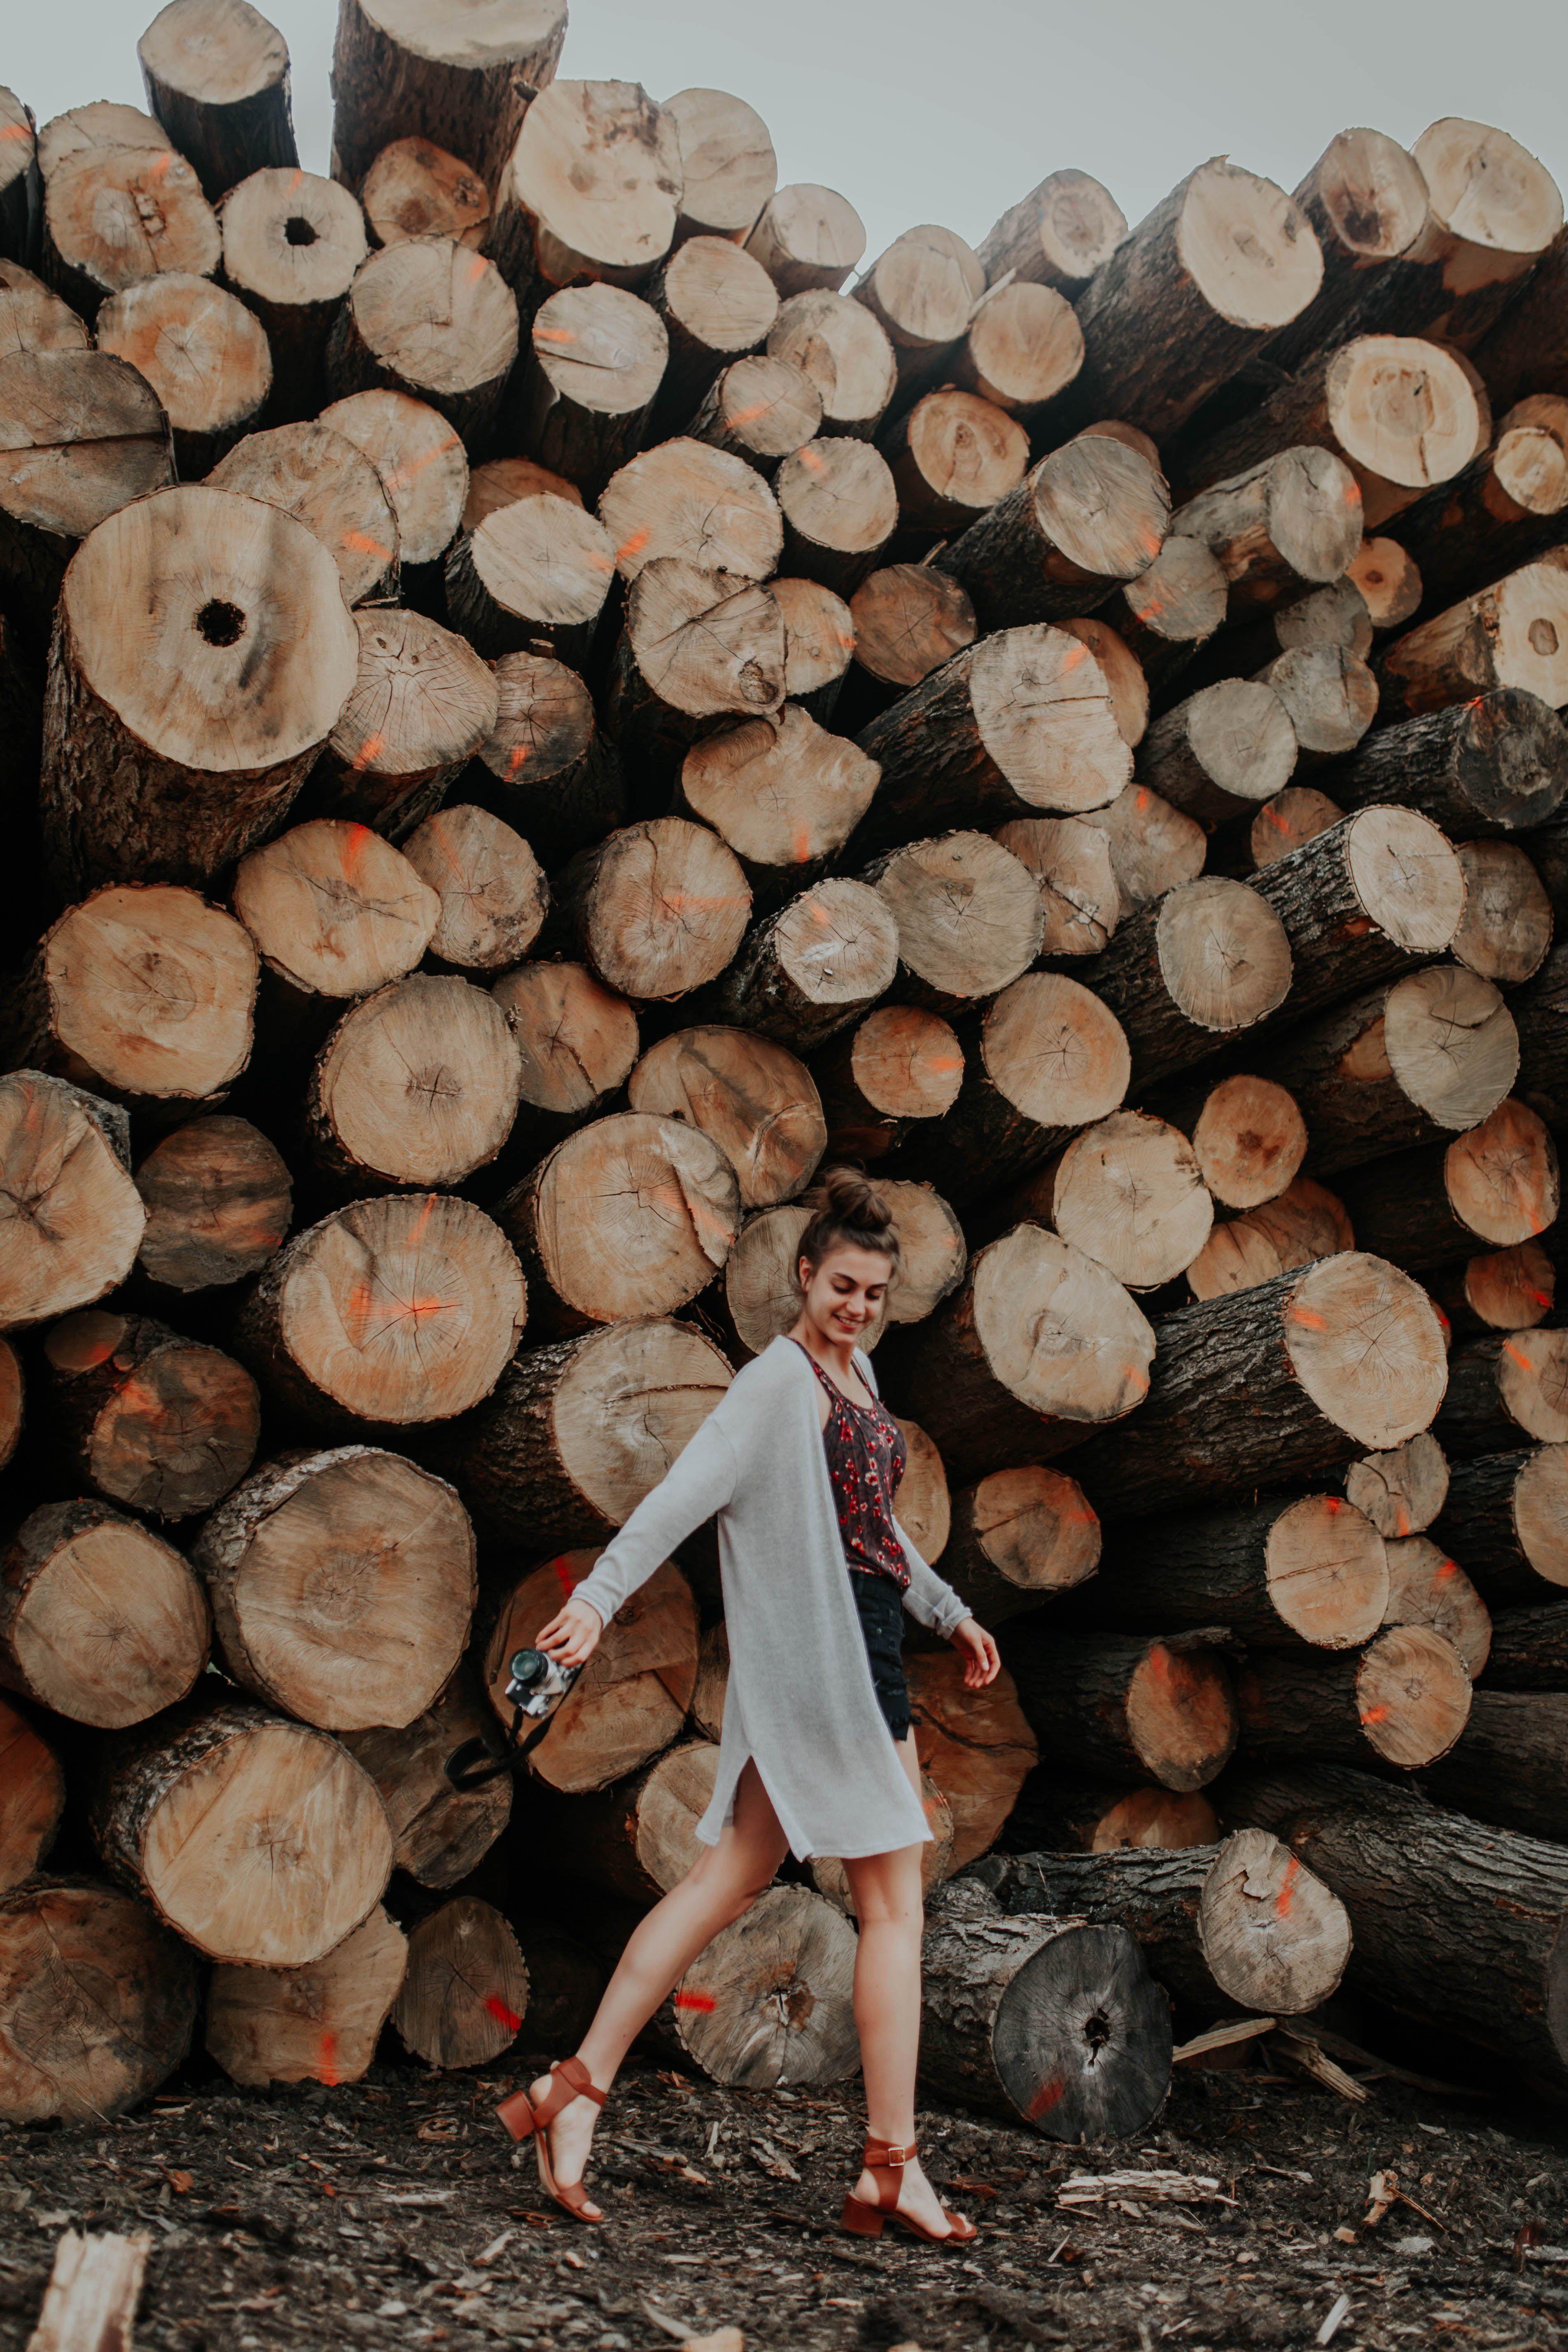 Tess Schilke Photography Portraits At A Lumber Yard Fall